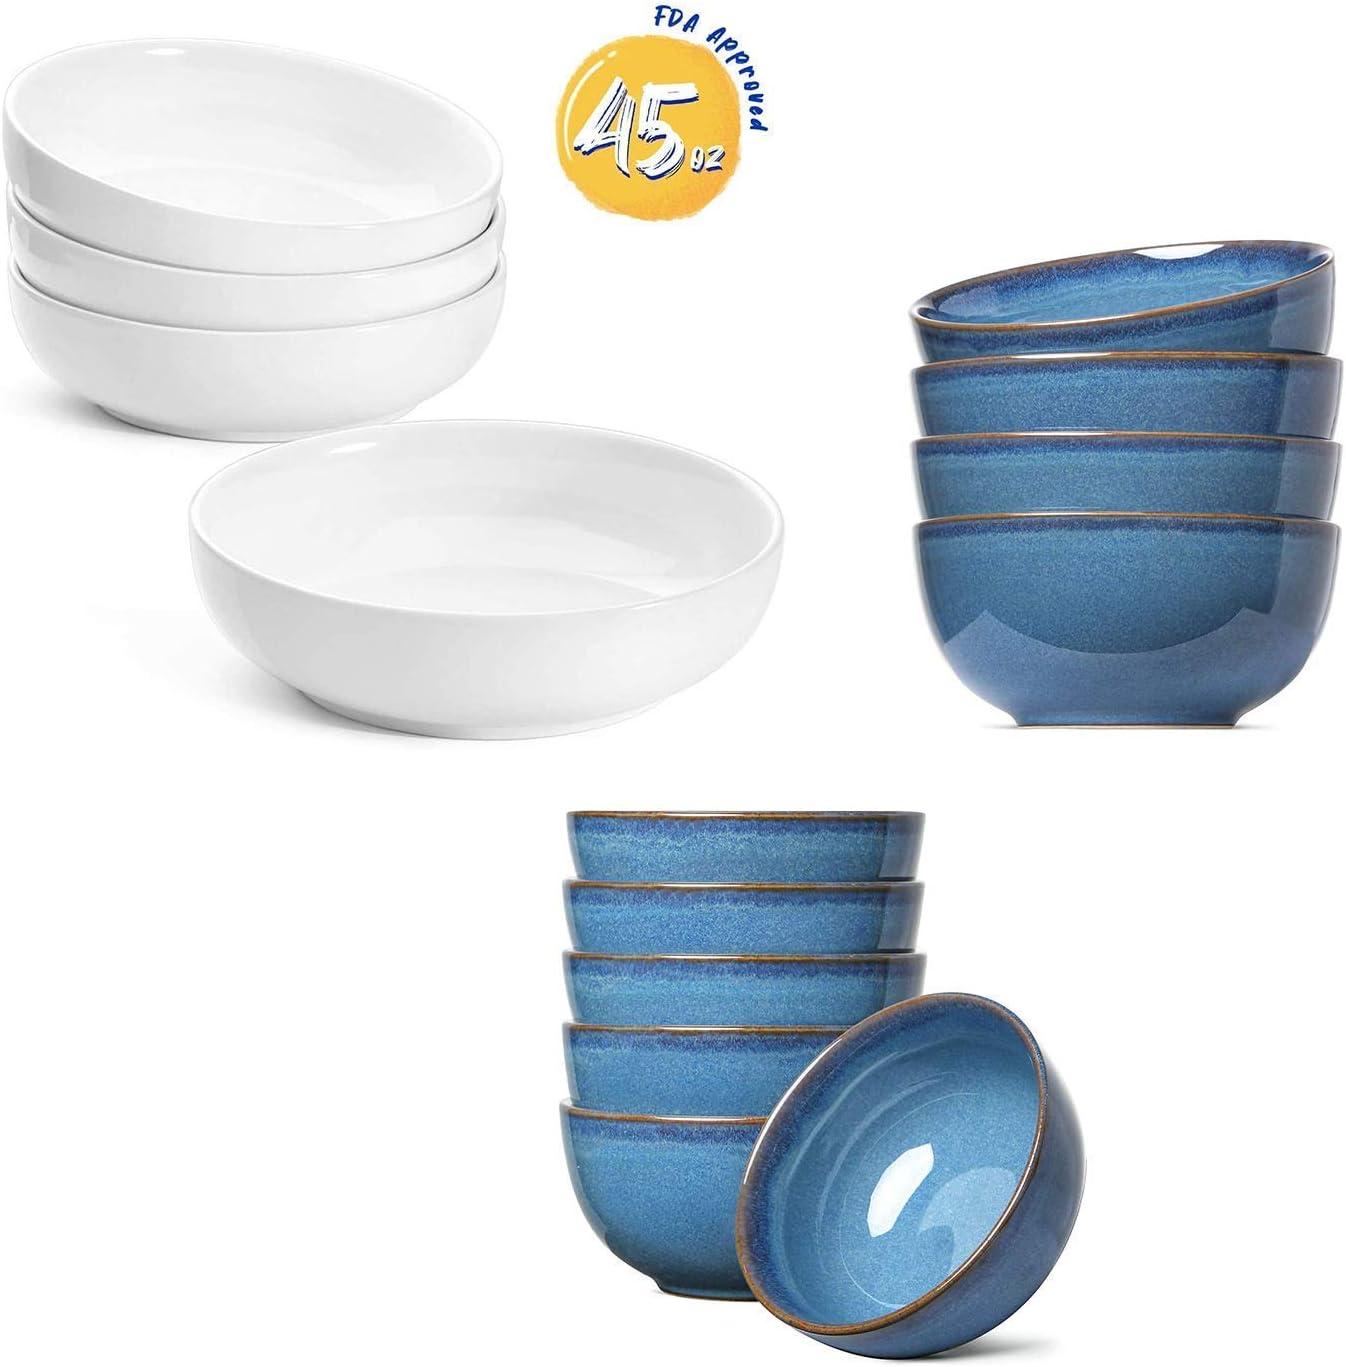 Amazon Com Le Tauci 45 Oz Pasta Bowls Set Of 4 20 Oz Soup Cereal Bowls Set Of 4 10 Oz Dessert Bowls Set Of 6 Kitchen Dining